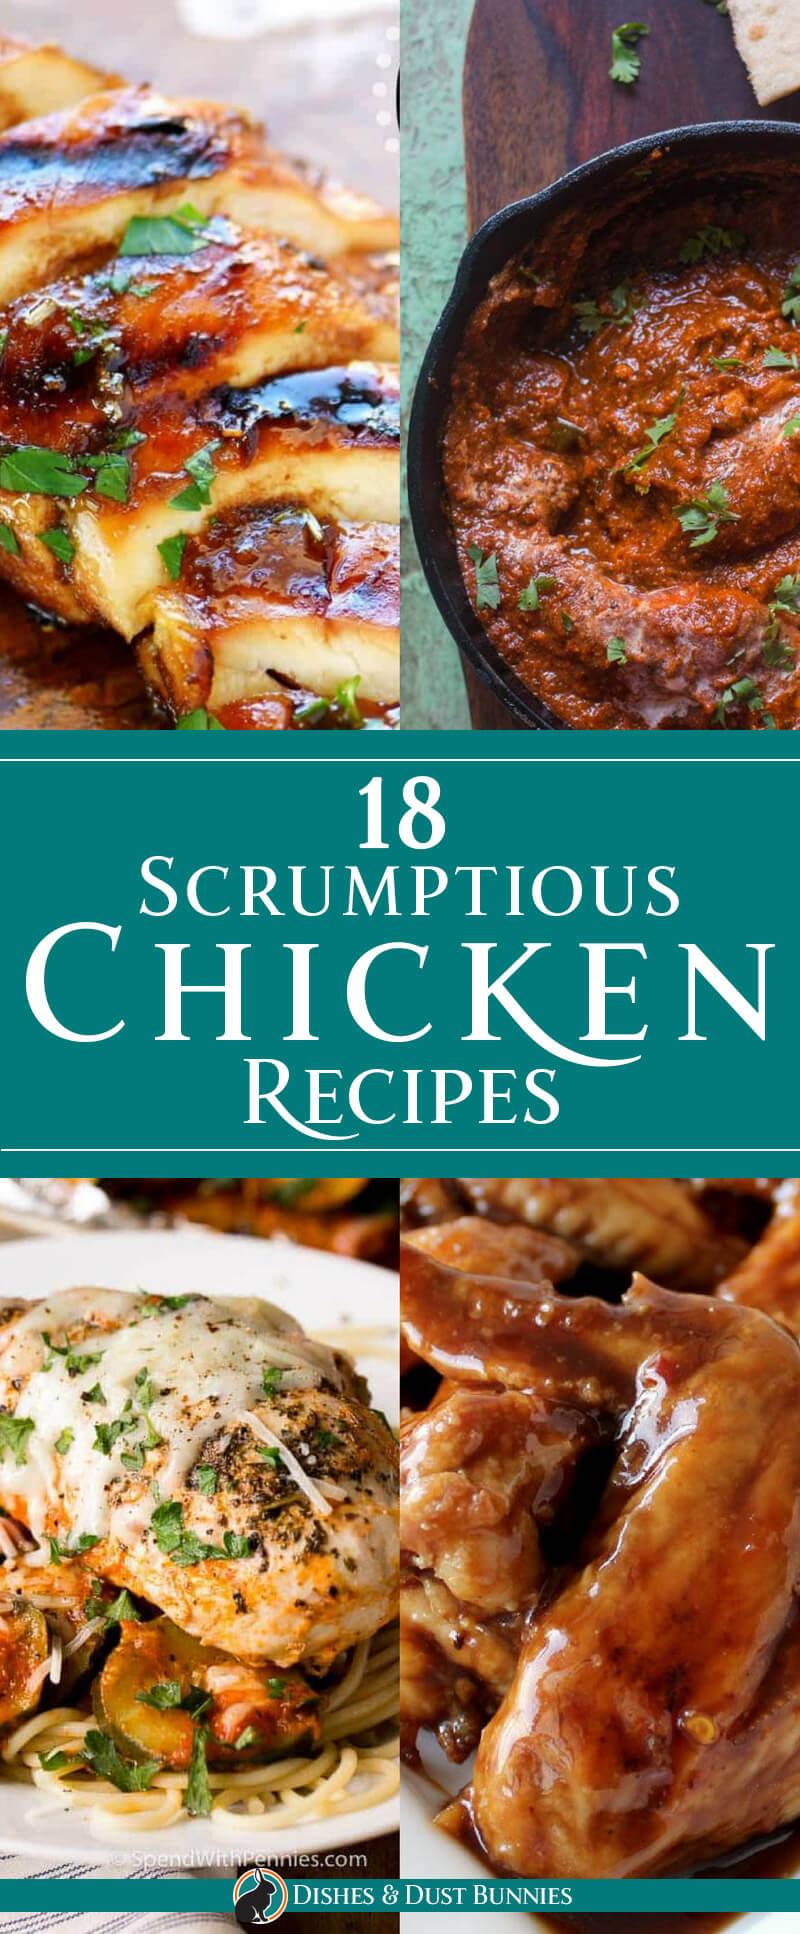 18 Scrumptious Chicken Recipes - dishesandustbunnies.com